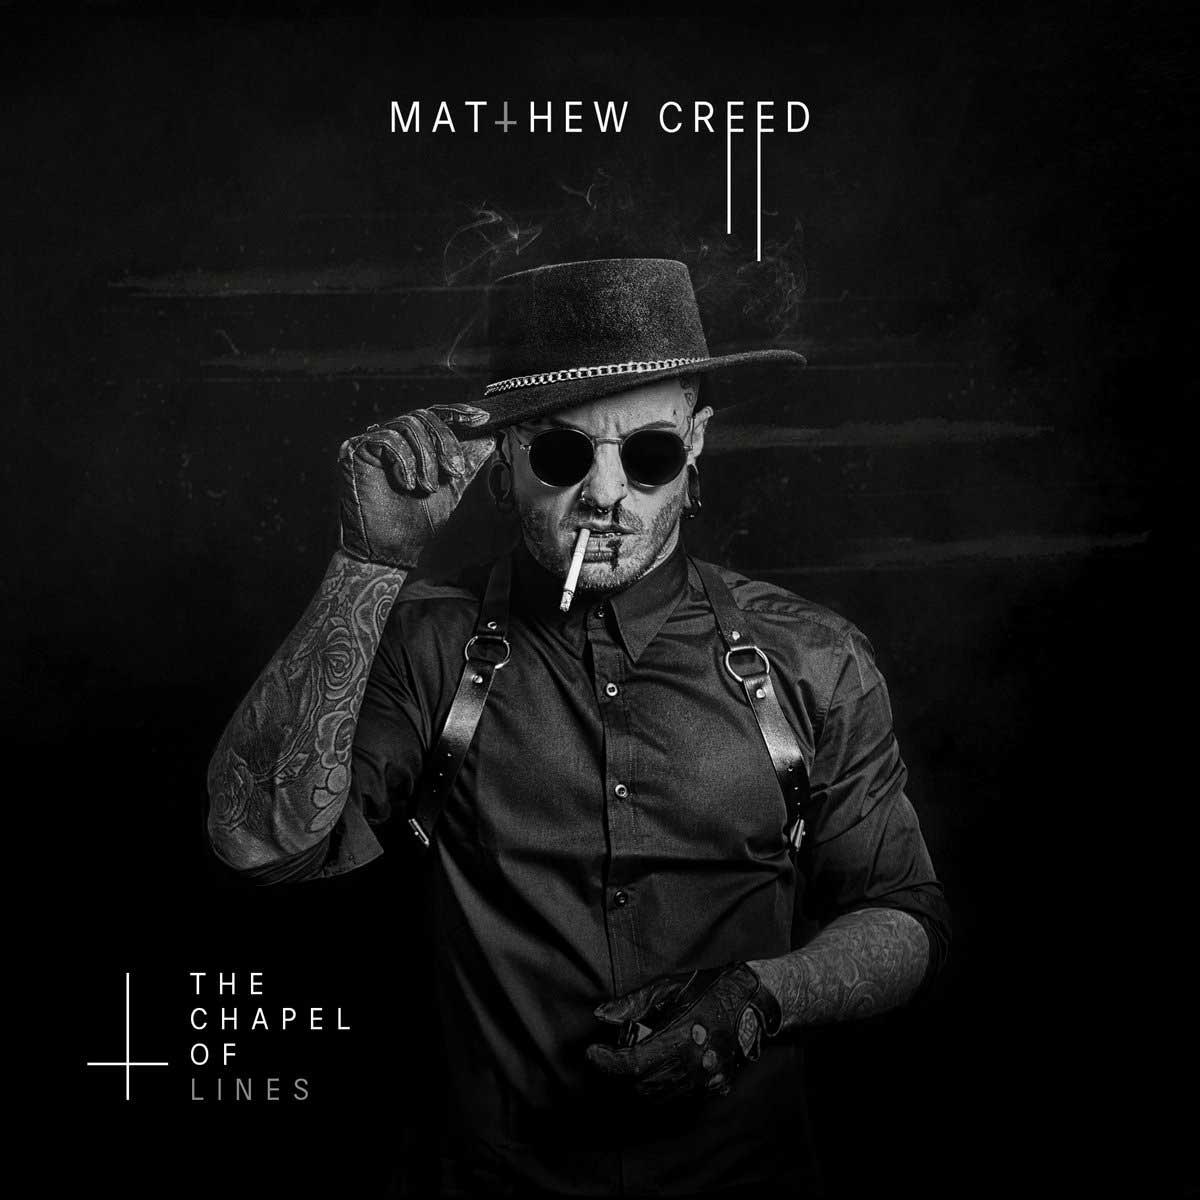 Matthew Creed - The Chapel Of Lines - Matthew Creed - The Chapel Of Lines